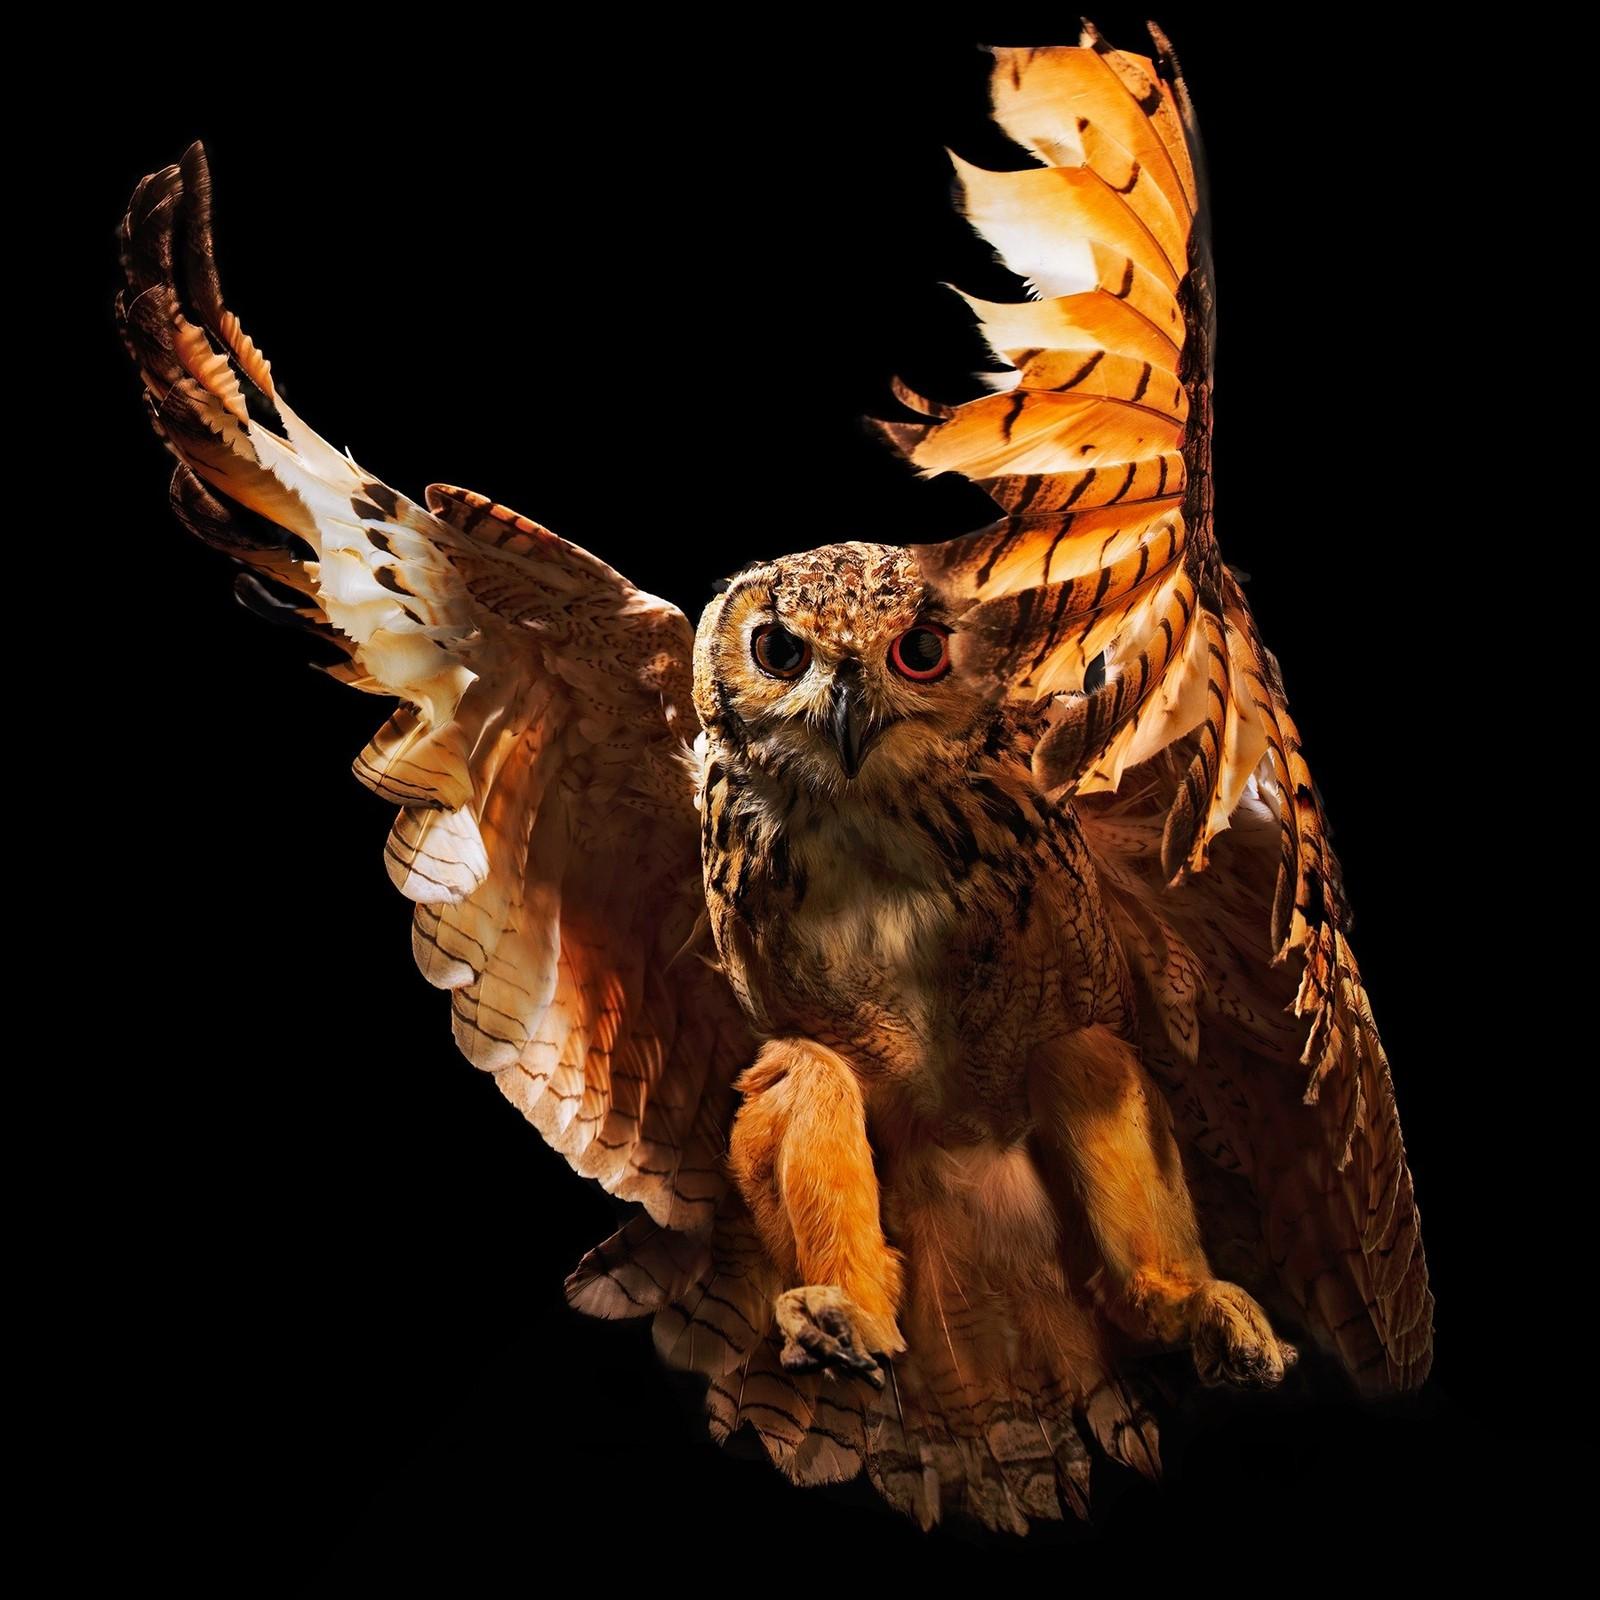 """Bengal Eagle Owl"" av Thomas Morel"